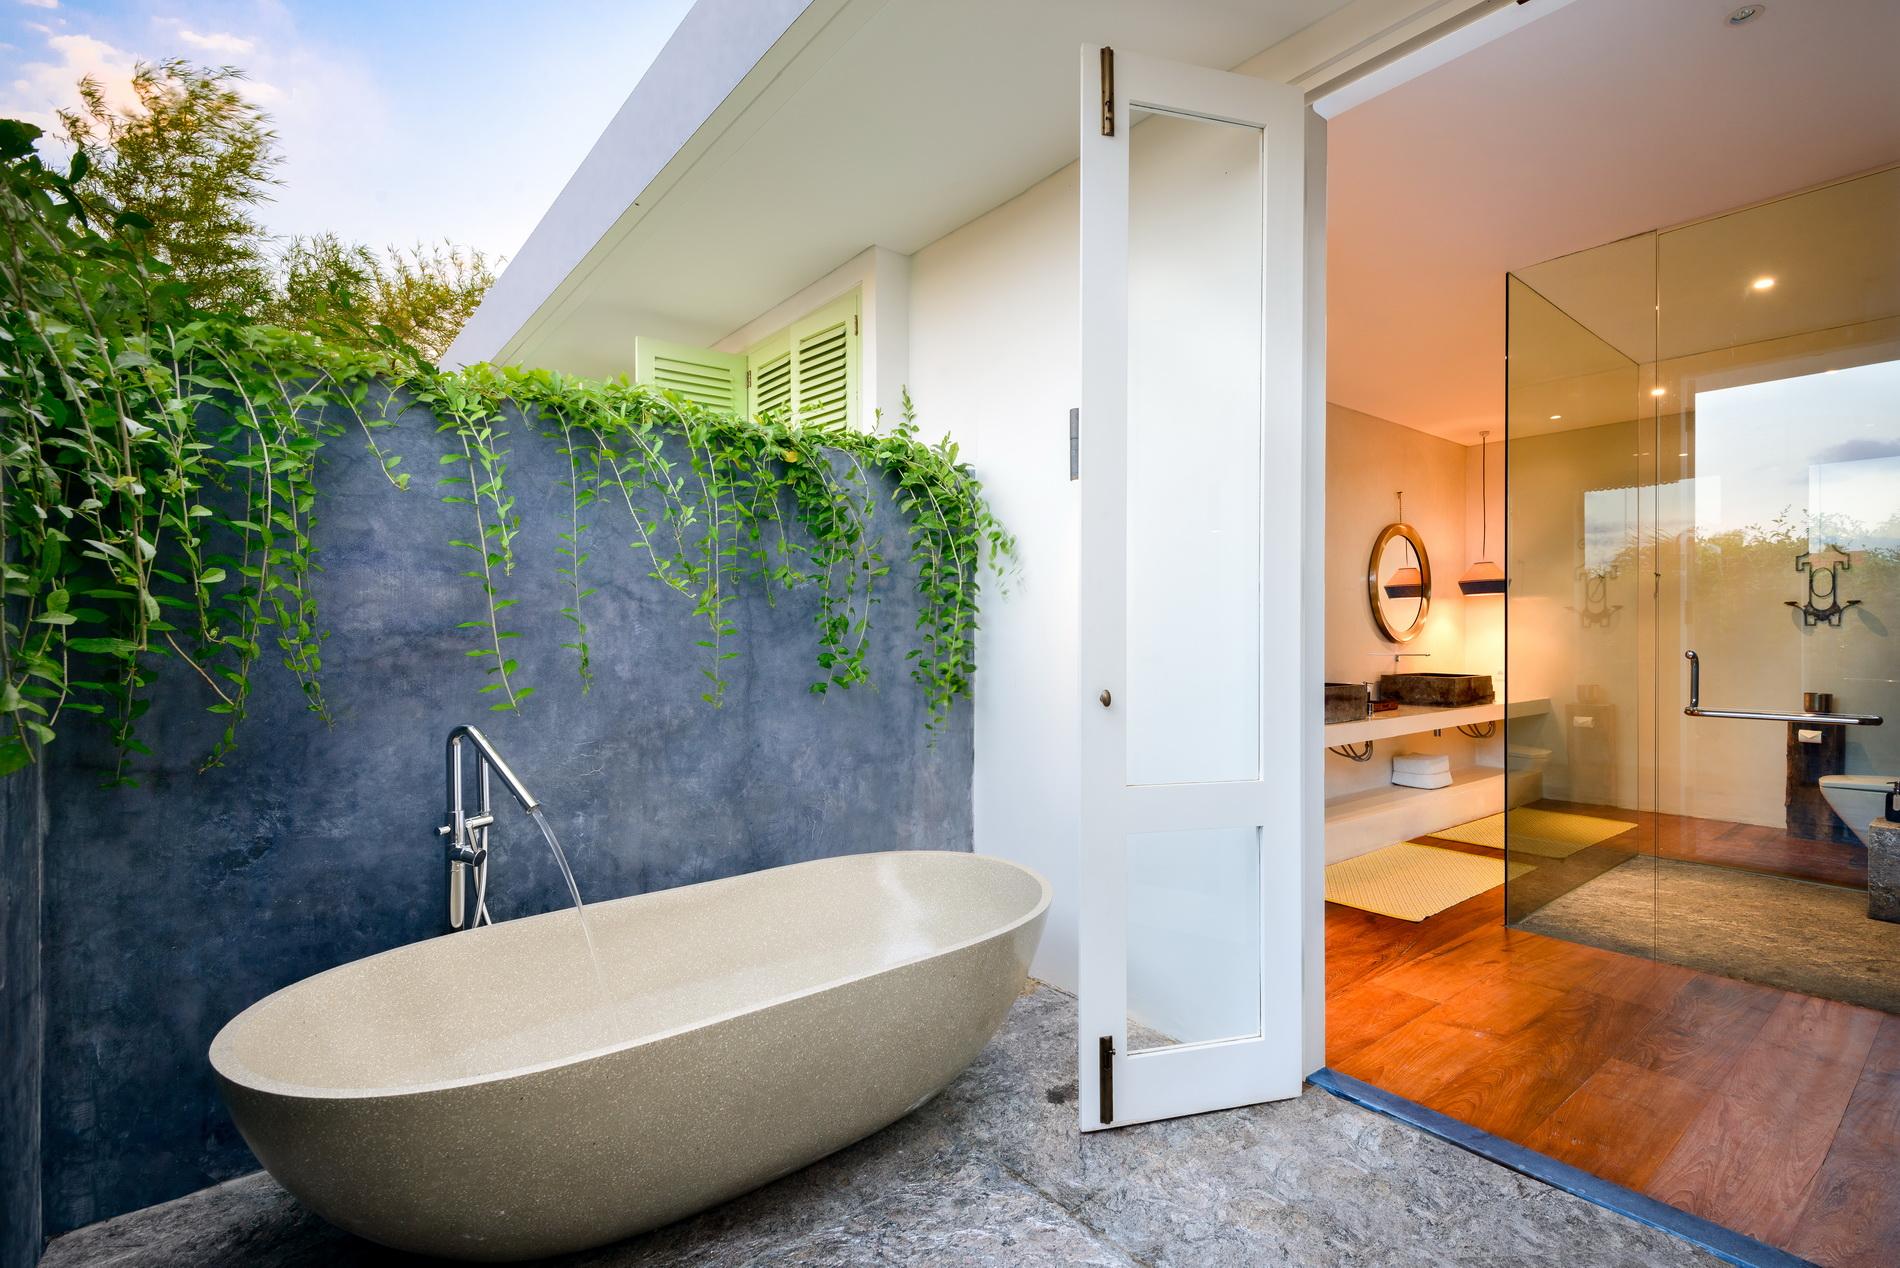 Vs Full Bathroom En Suite Bathroom: Villa-1880-batubelig-bedroom-ii-ensuite-bathroom-outside